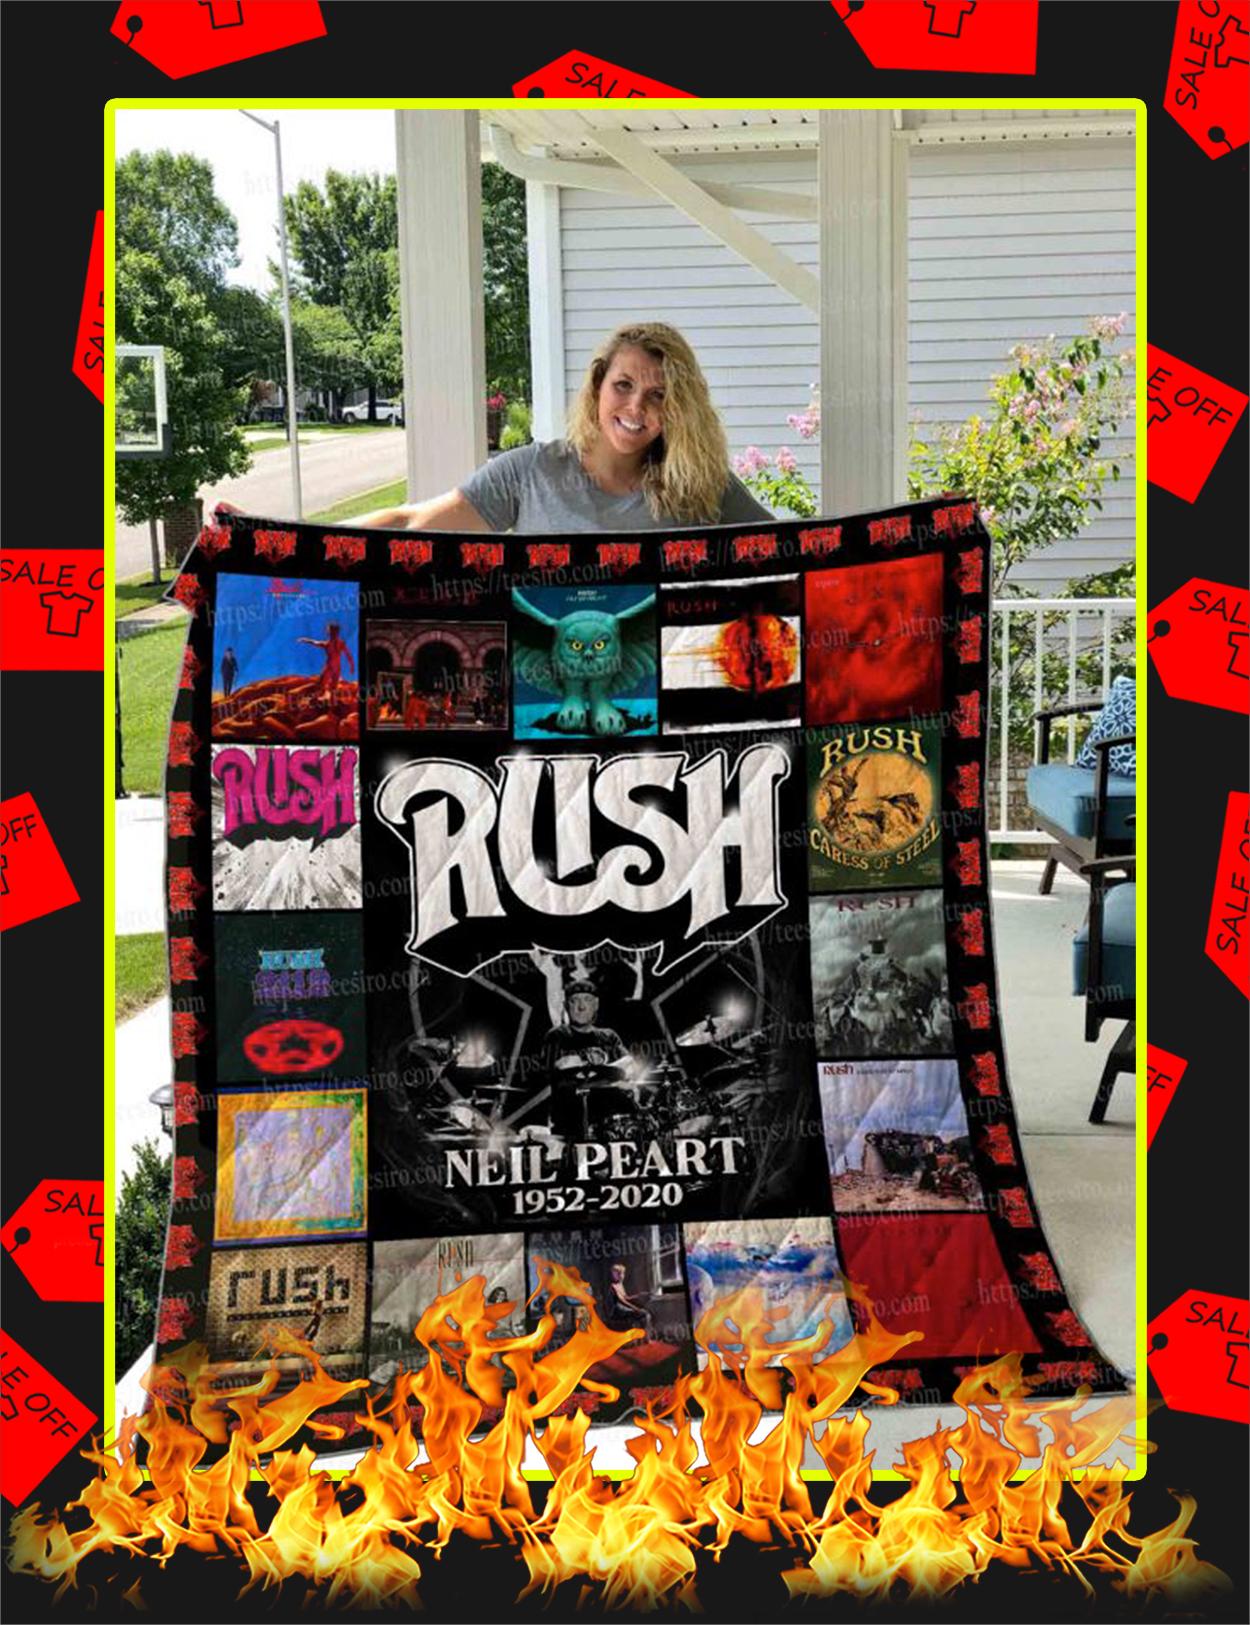 Rush Neil Peart Quilt Blanket - Queen